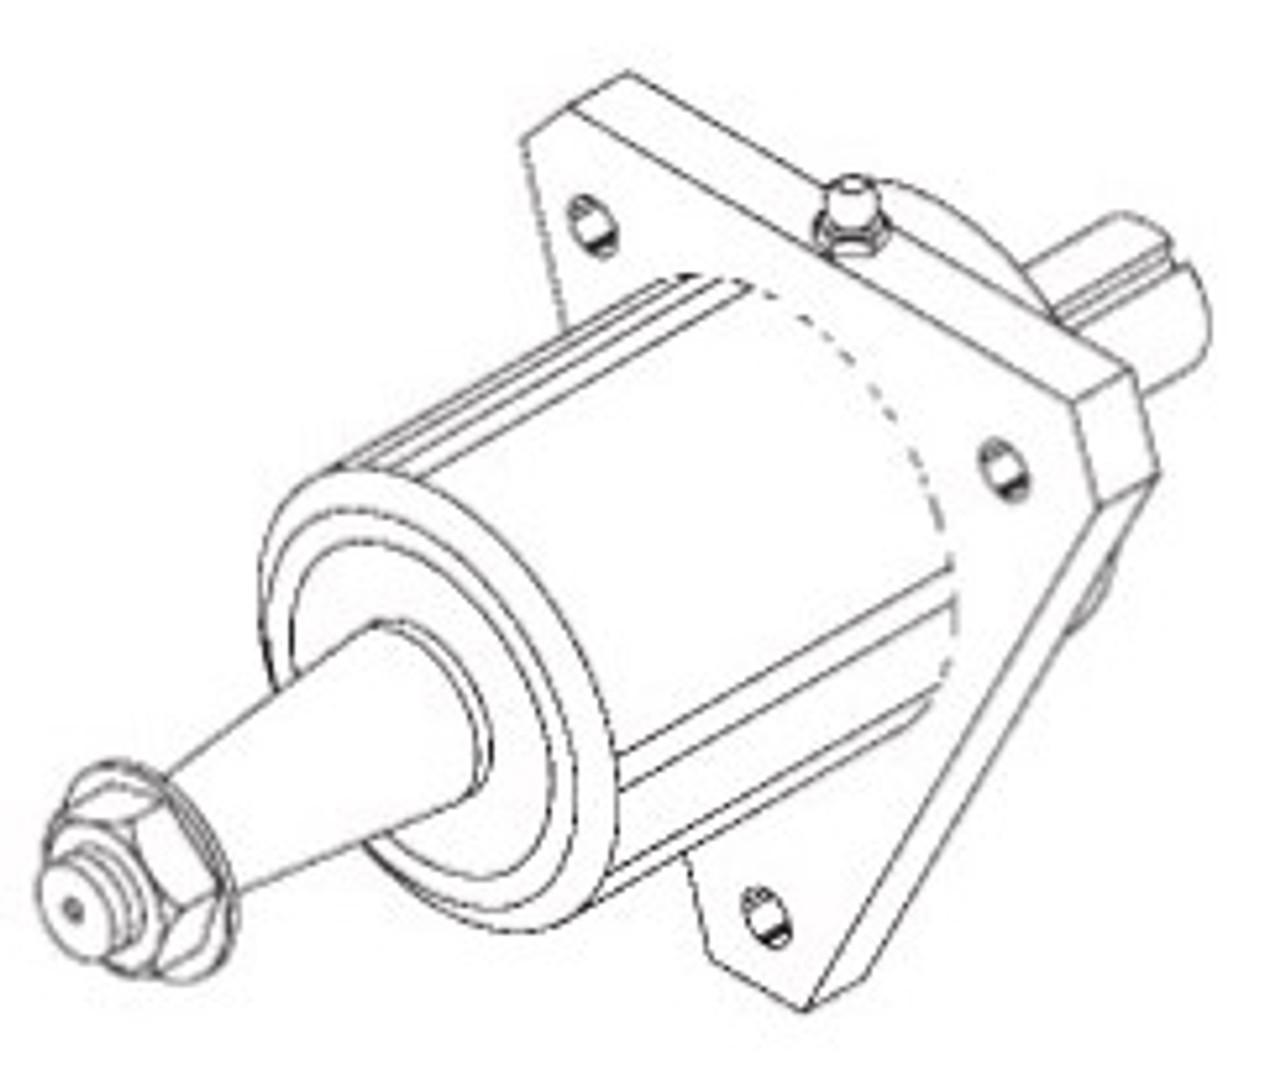 Butcher Boy SA20 - Lower Wheel Main Bearing Housing Assembly - BB181A